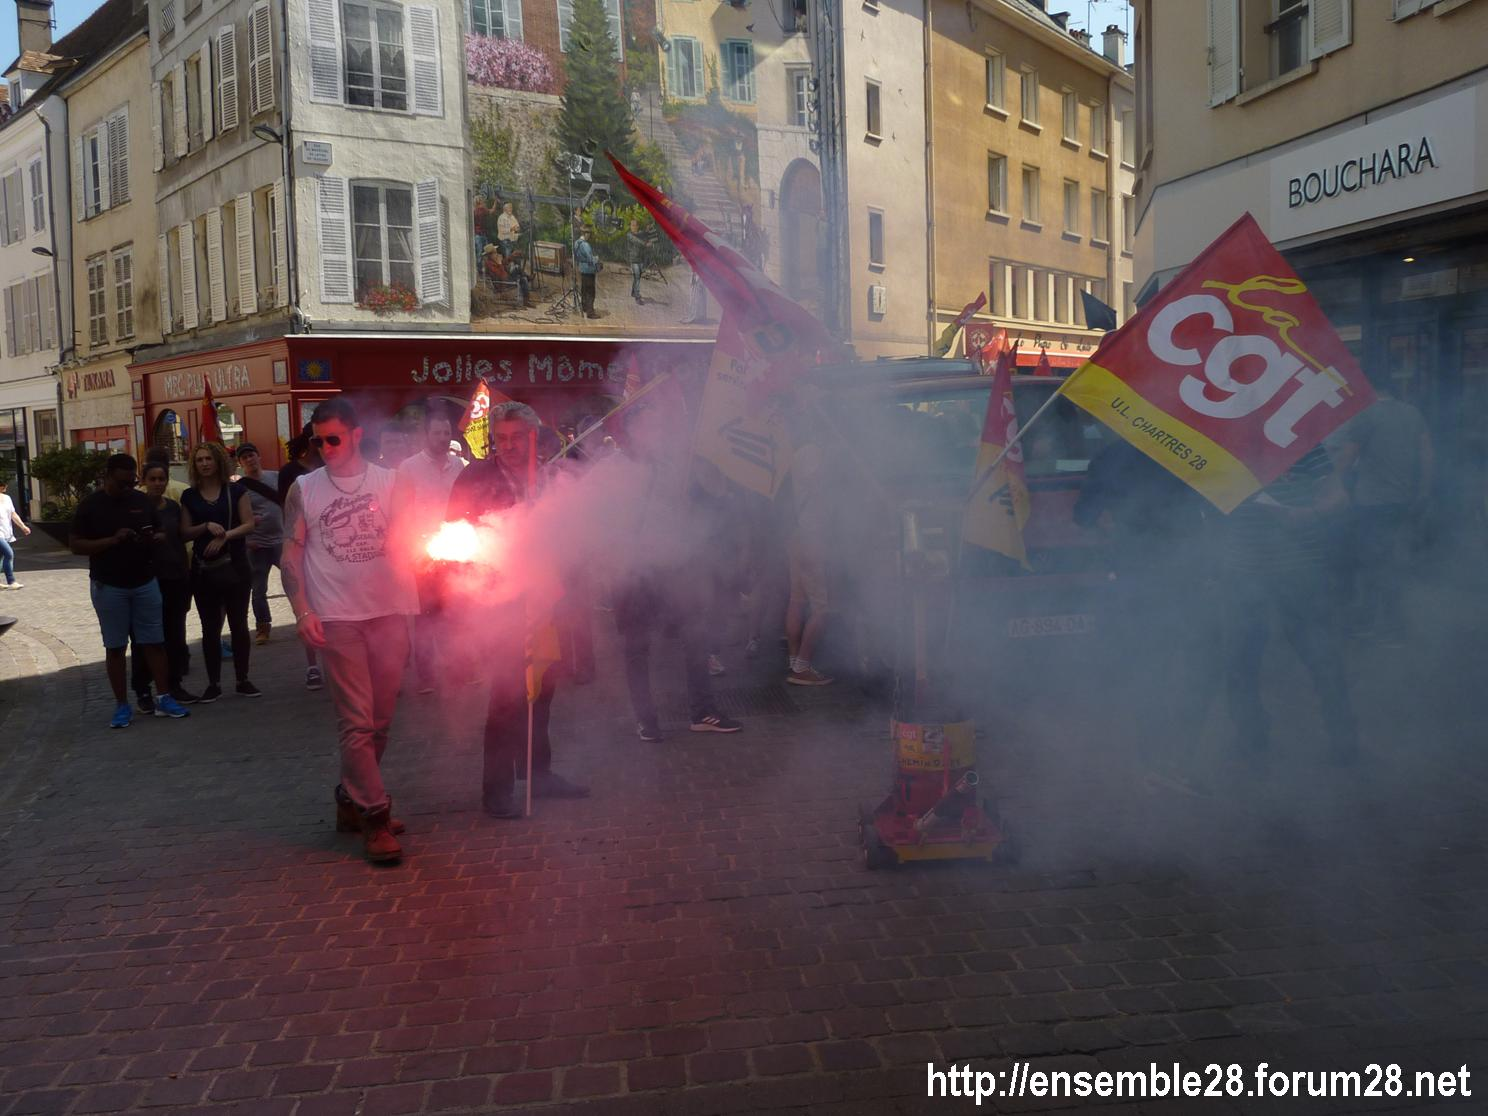 19-04-2018 Chartres Manifestation Interprofessionnelle CGT Solidaires SNES-FSU n°05